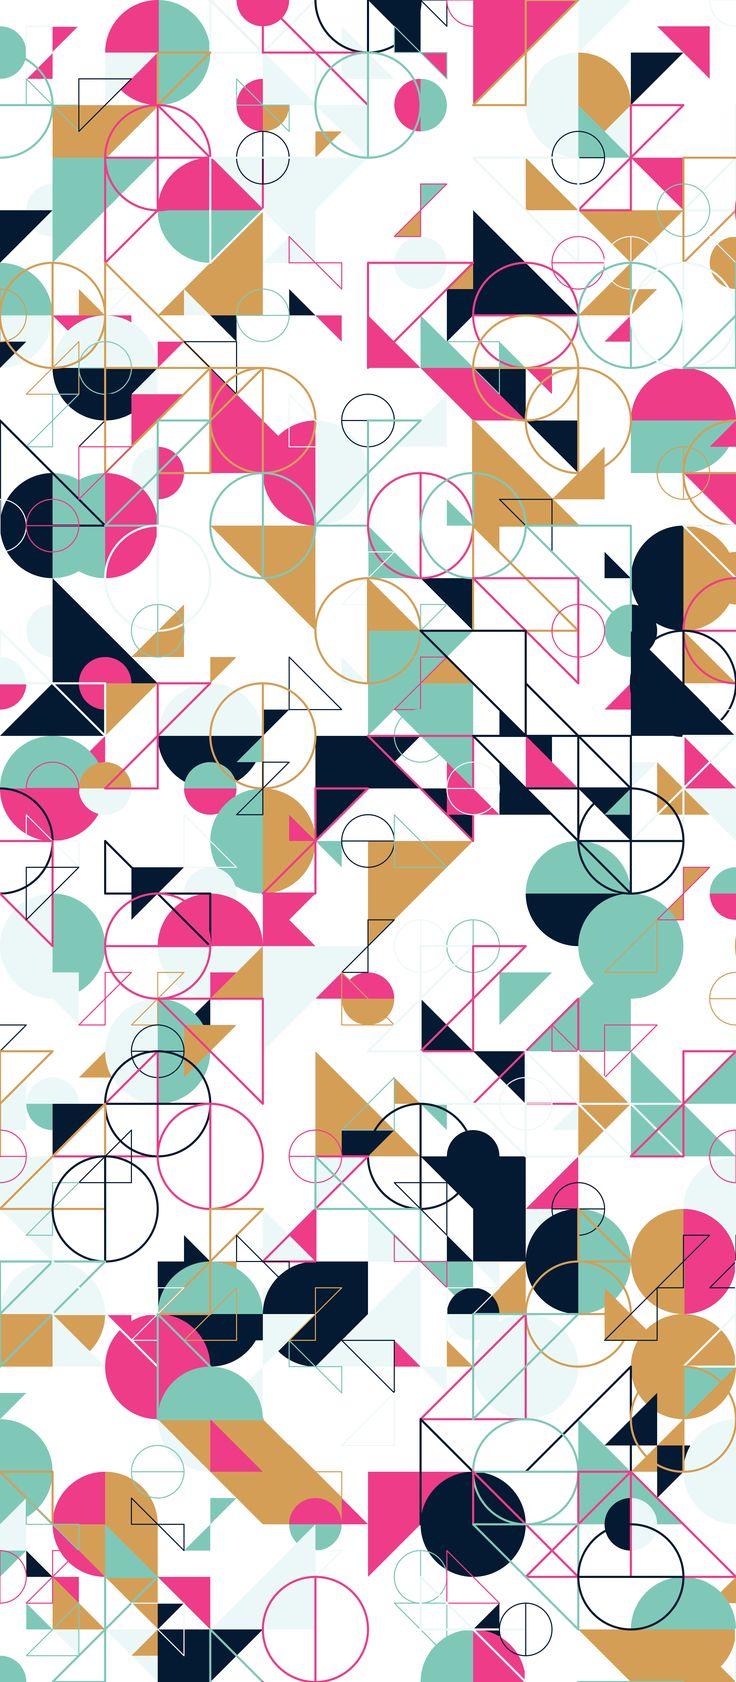 Russfussuk 'GoodGracious' M8A #pattern #patterndesign #patternprint #circles #shapes #lines #generative #geometria #cadernos #padrões #russfussuk